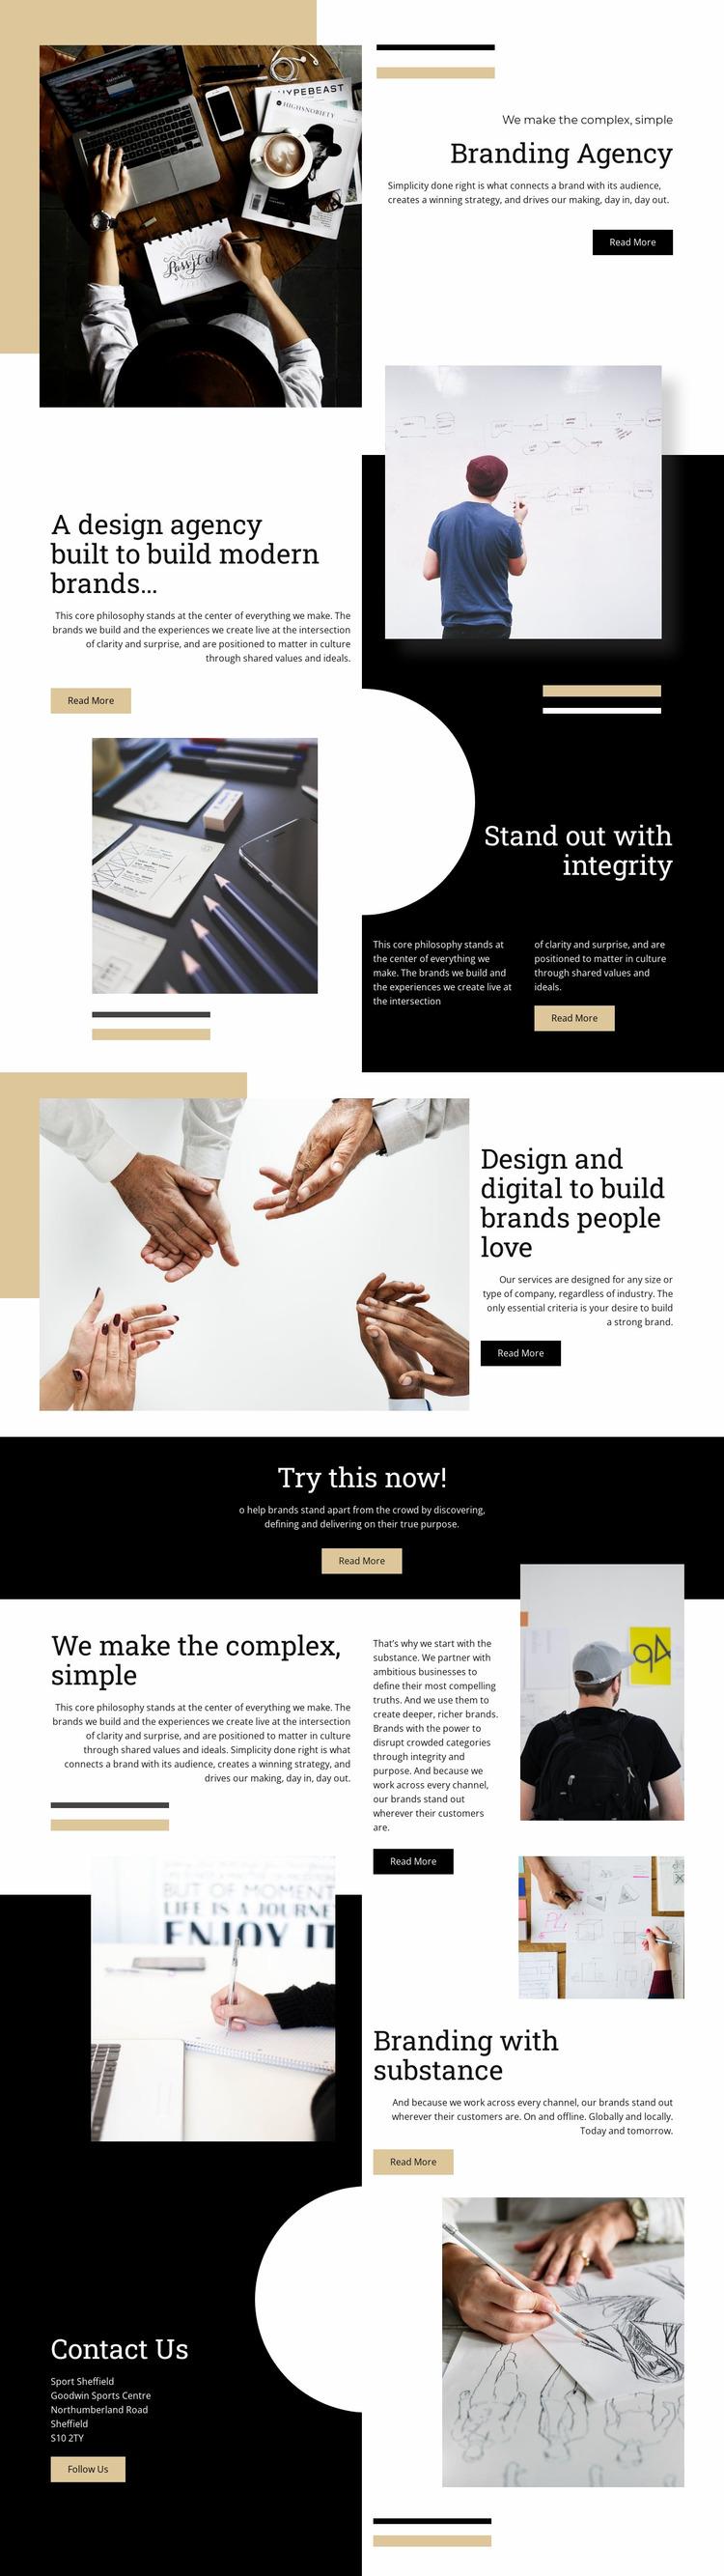 Branding Agency Website Mockup